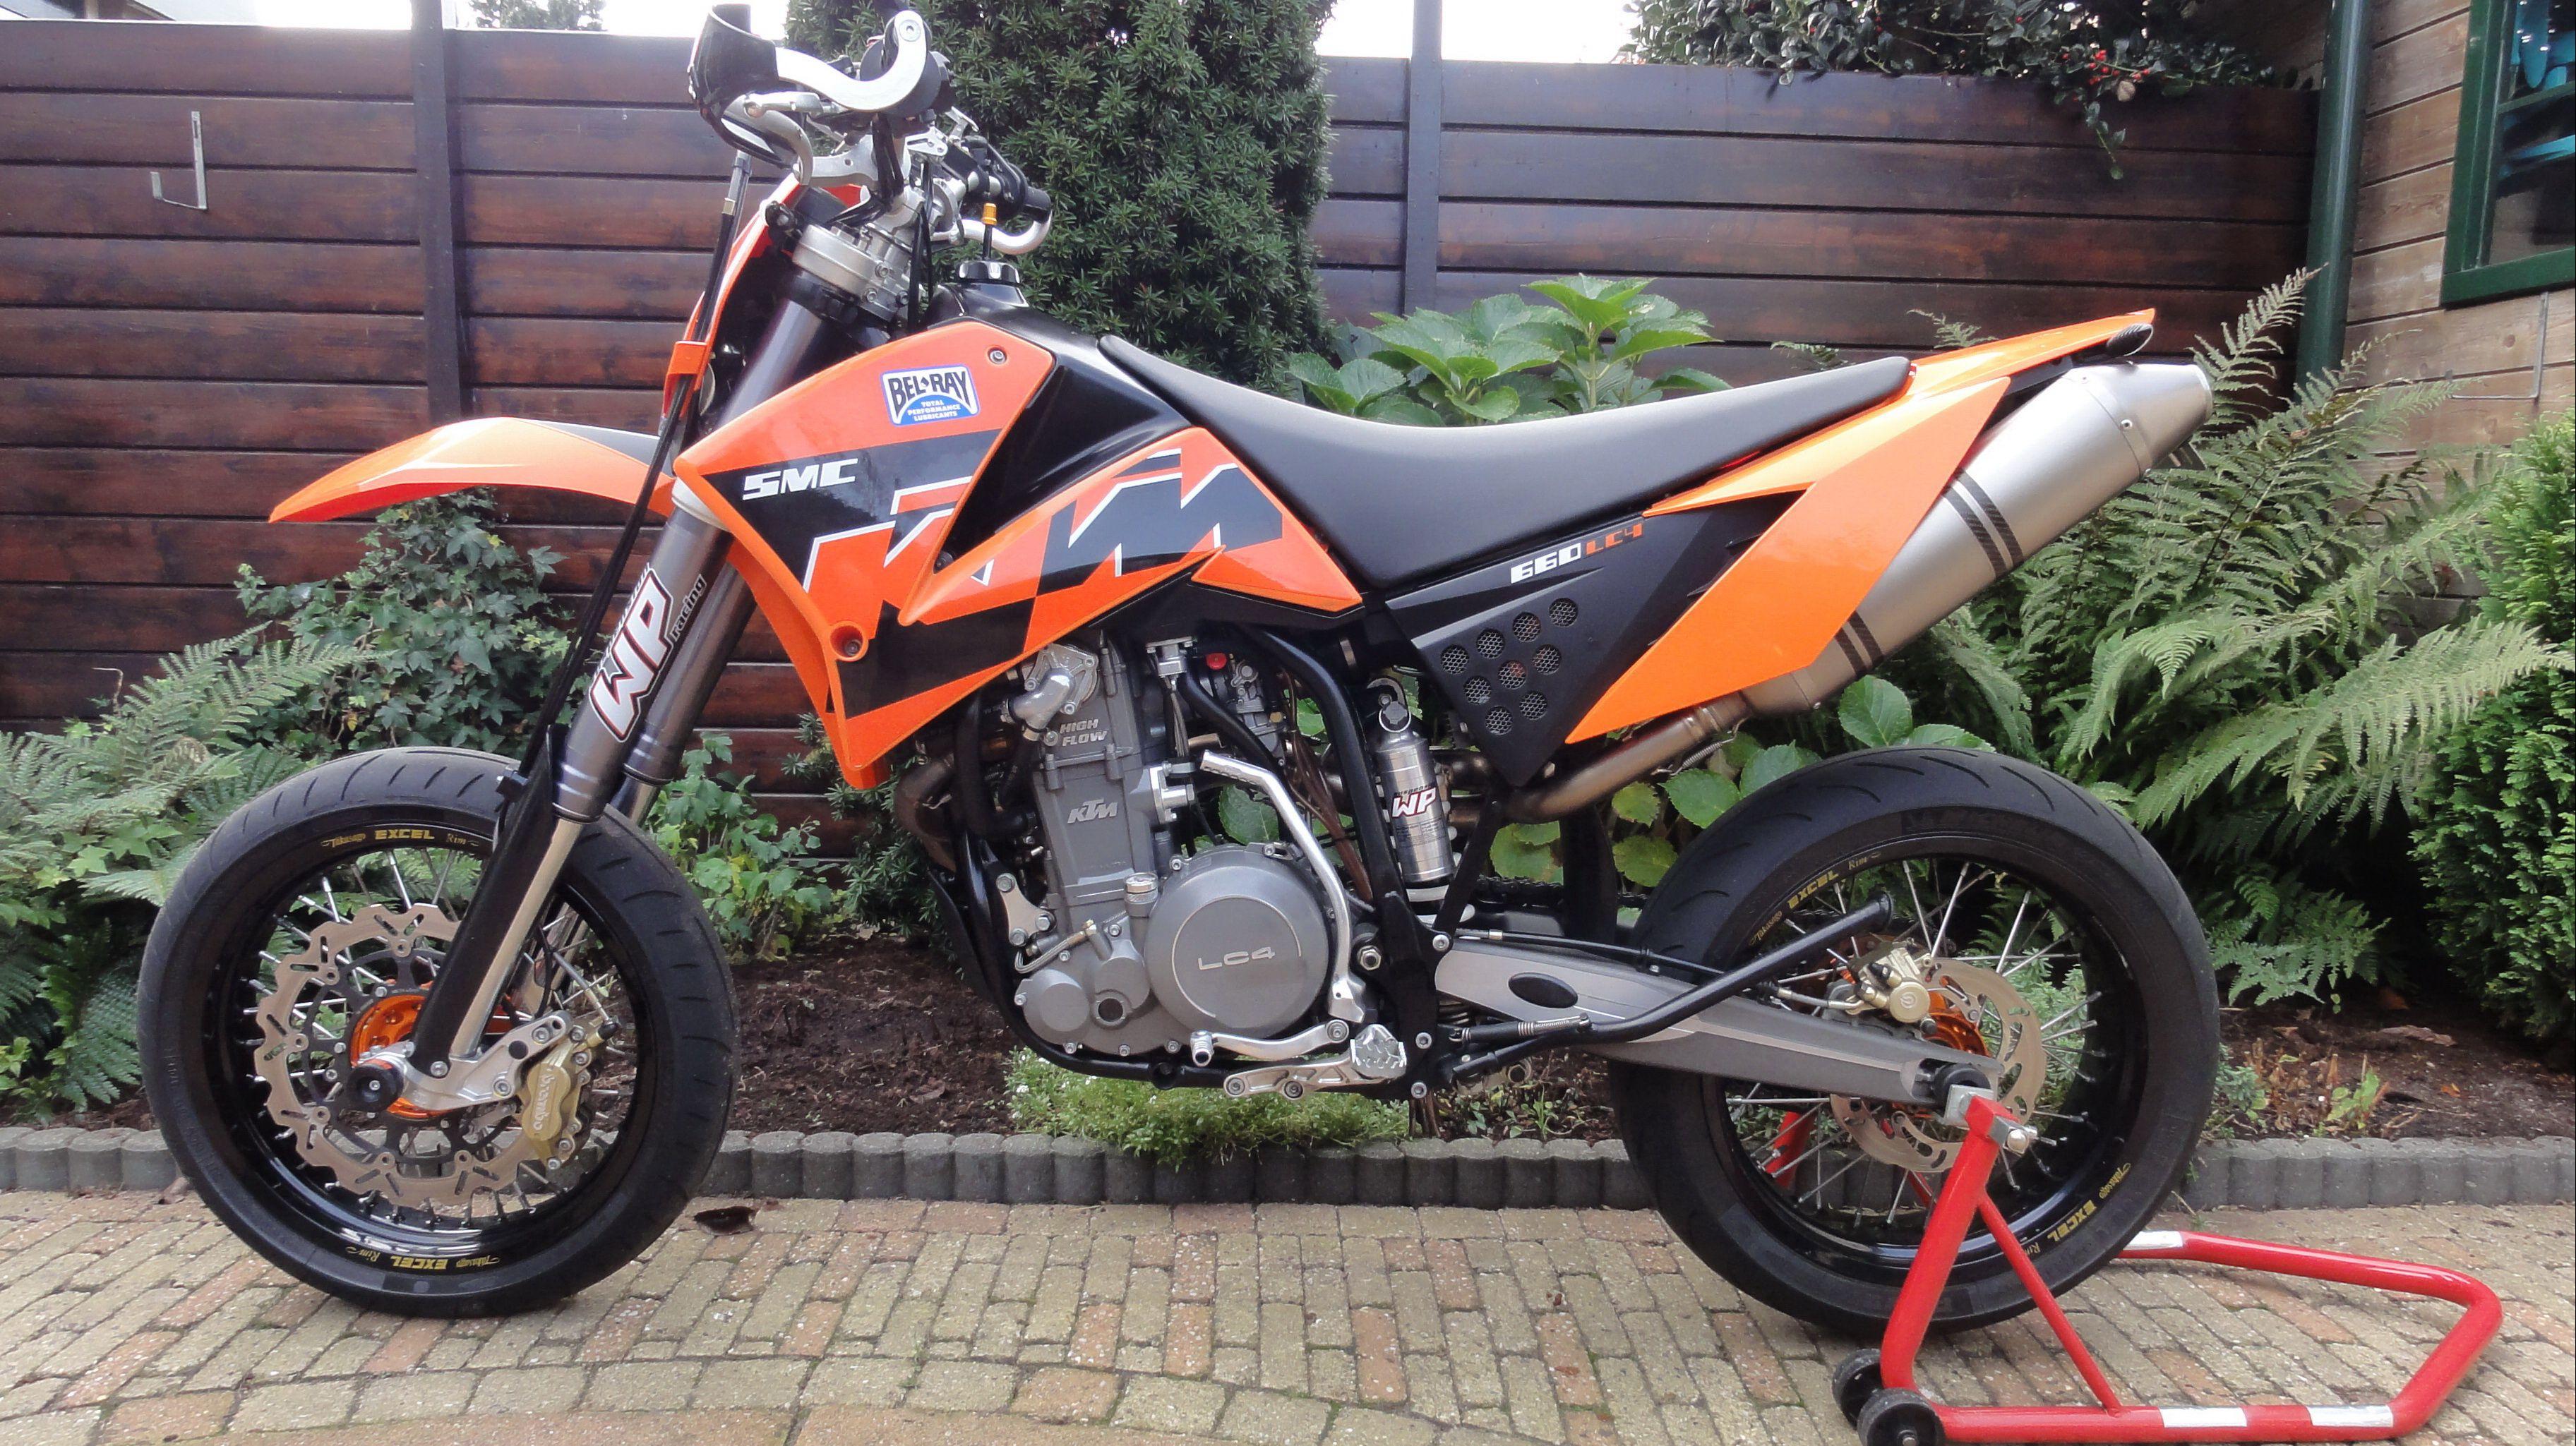 2007 KTM 660 SMC | KTM | Bike, Motorcycle, Vehicles